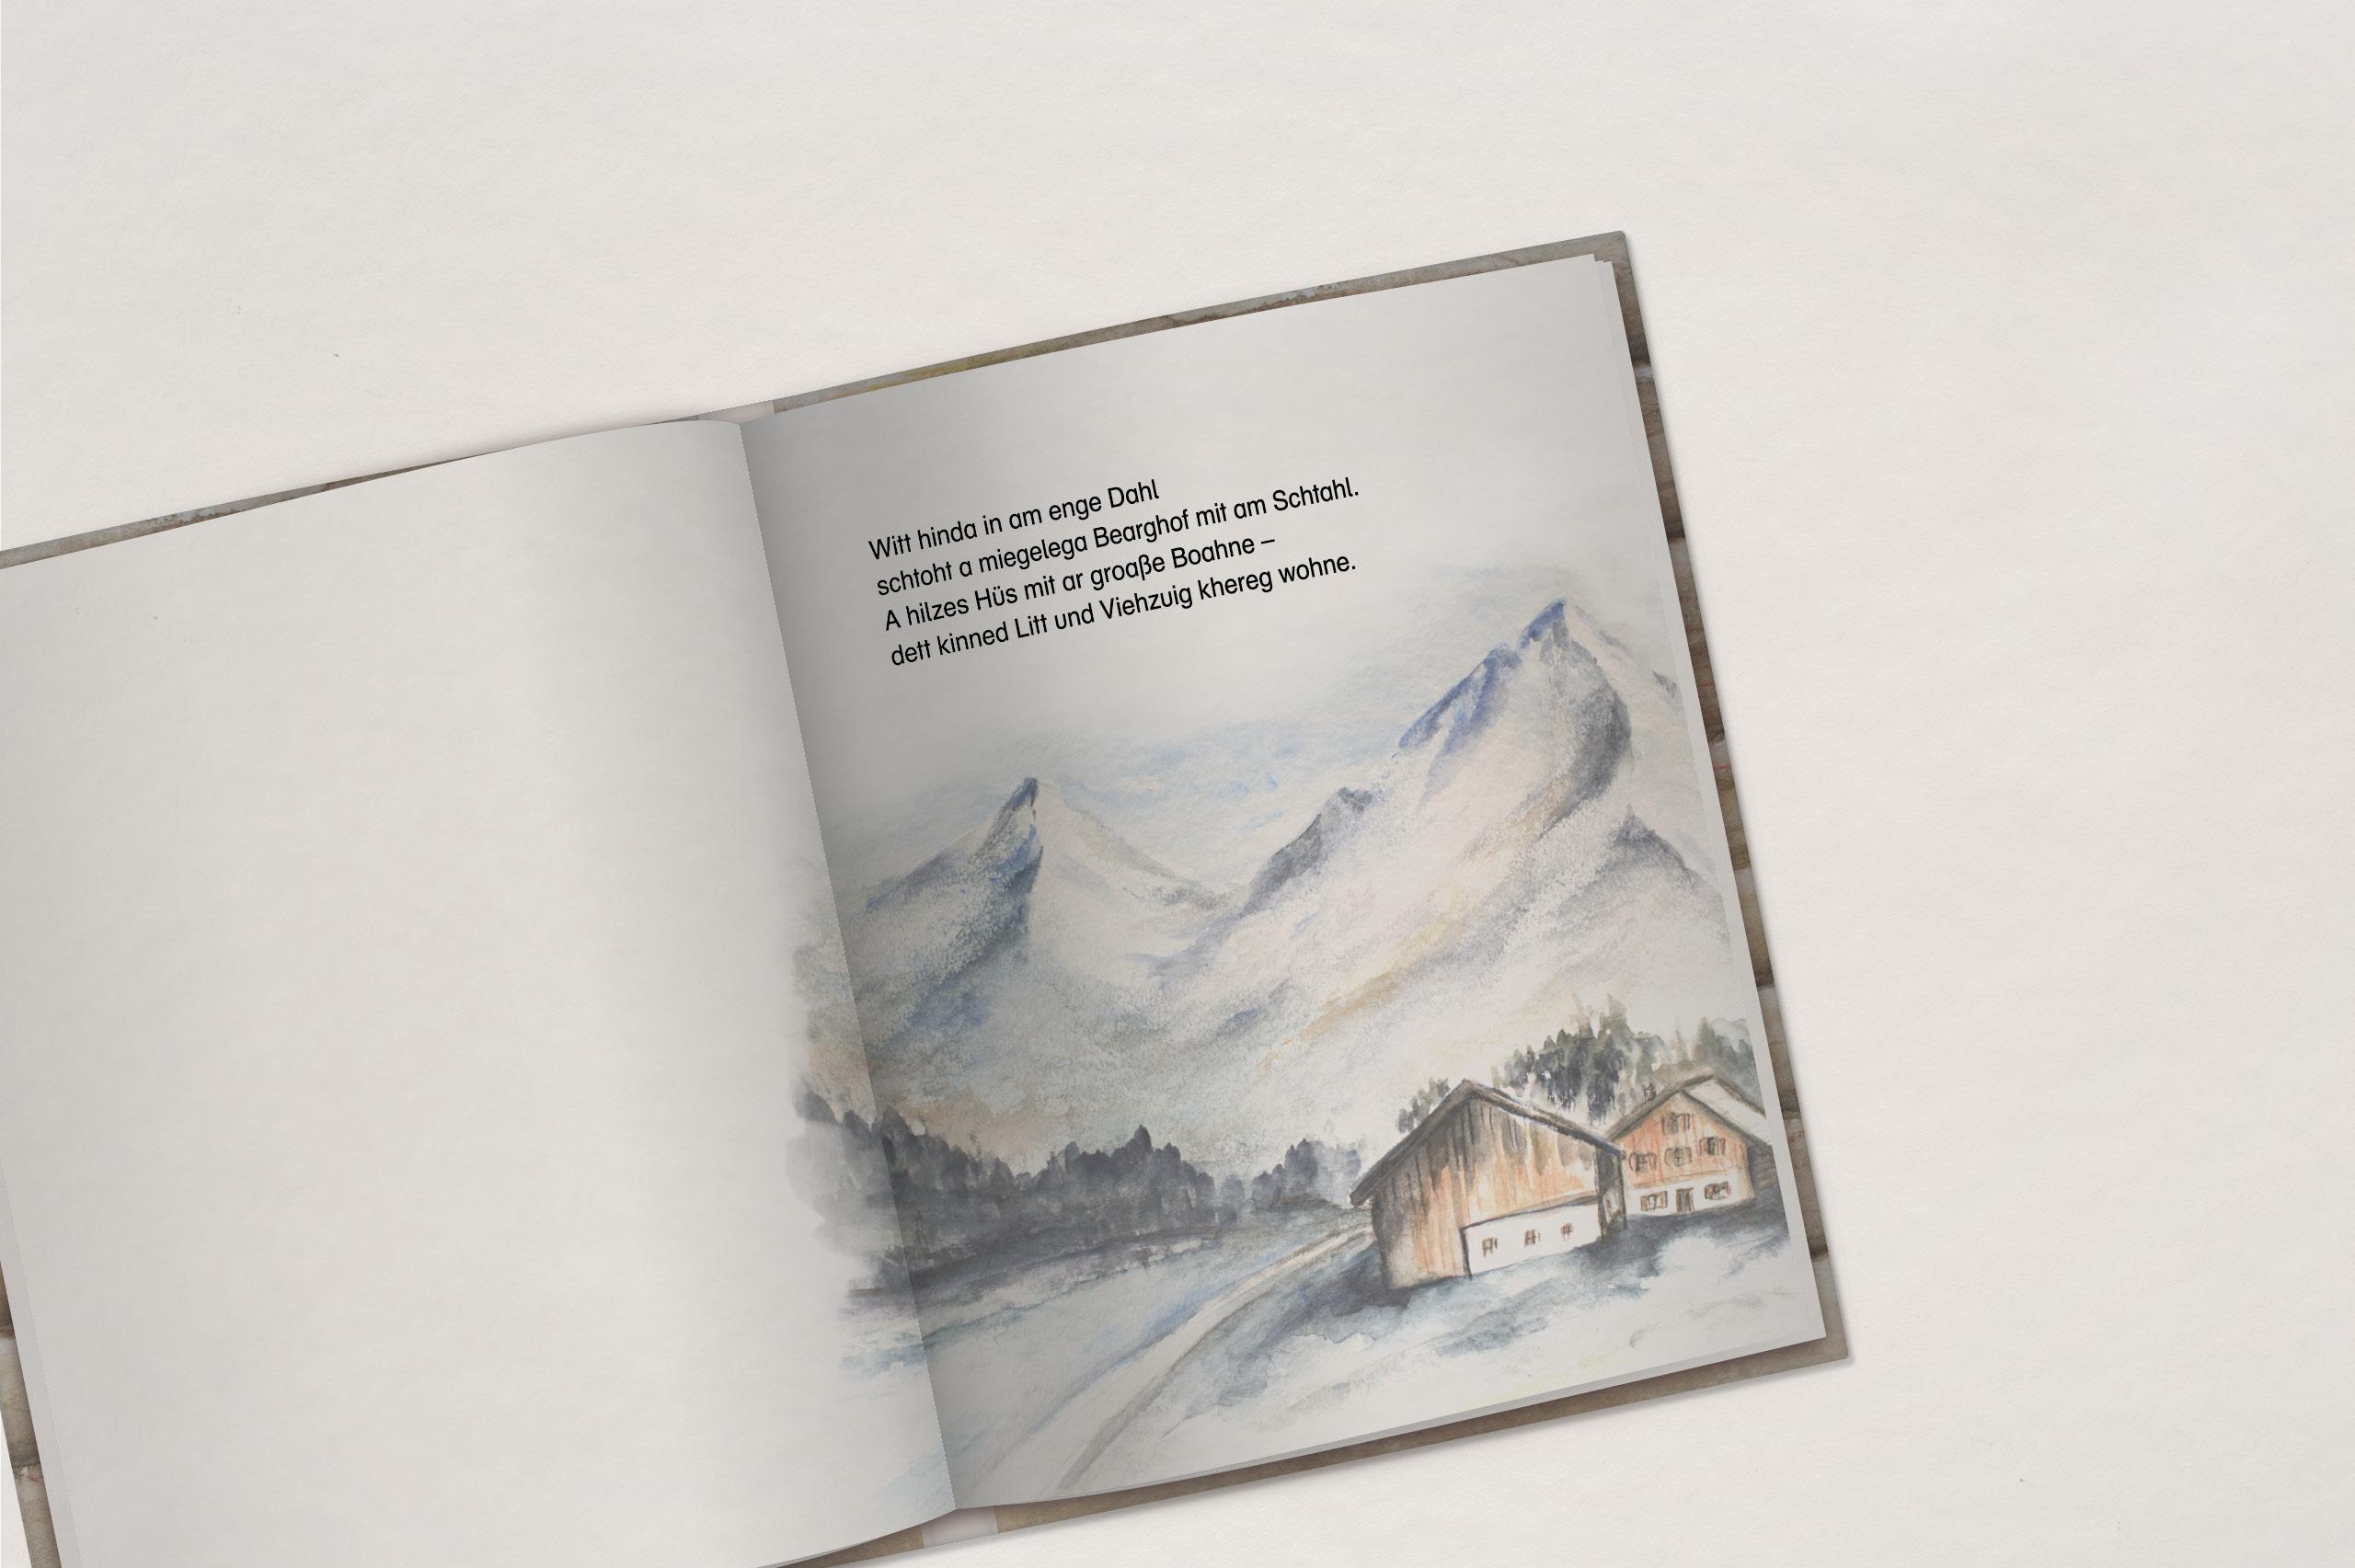 Elliane Besler Buchautorin Oberstdorf Kinderbuch - elliane-besler